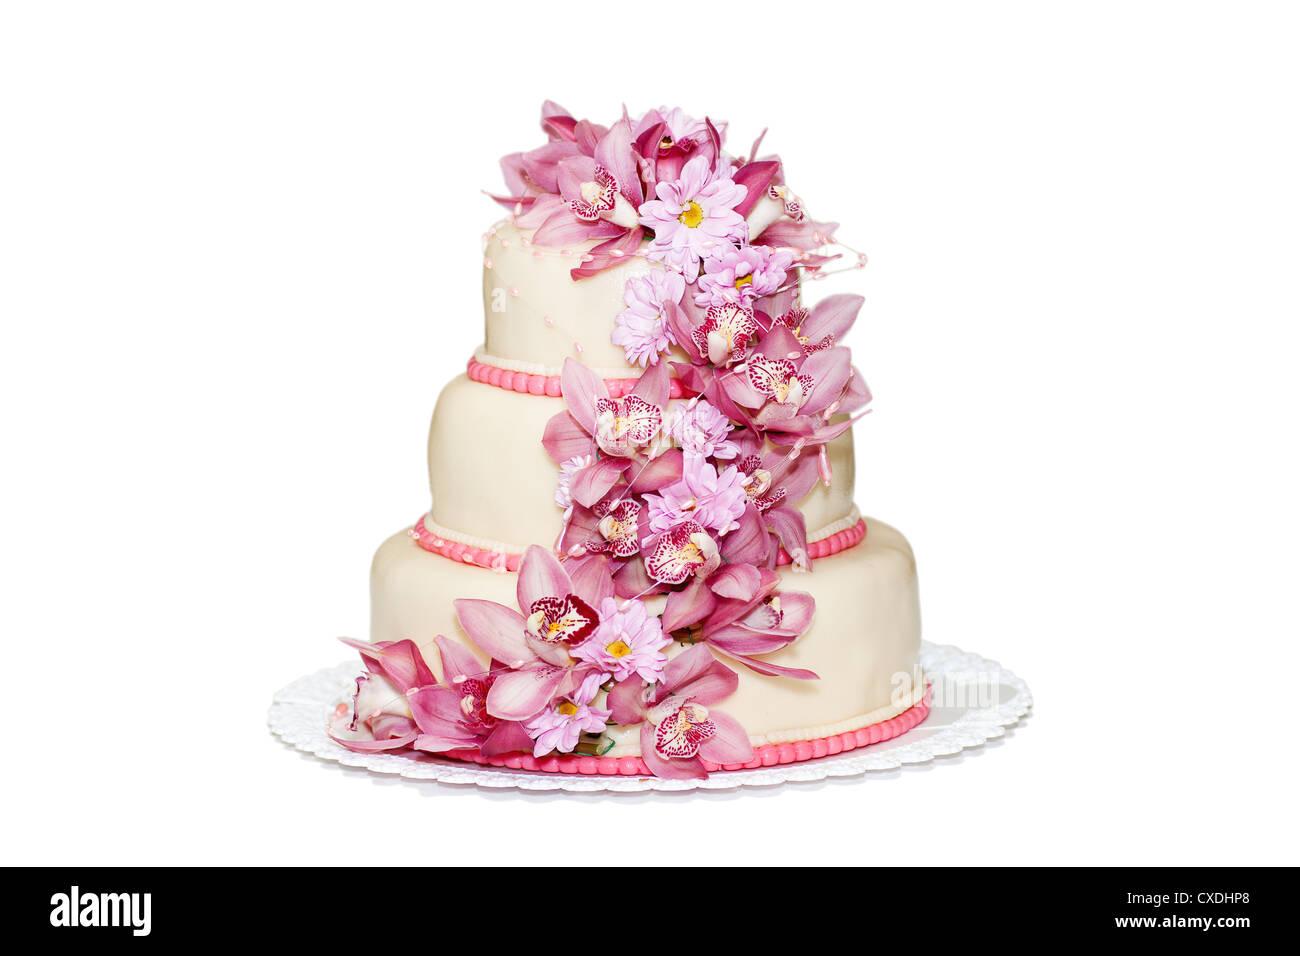 Traditional Wedding Cake On A White Background Stock Photo 50701120